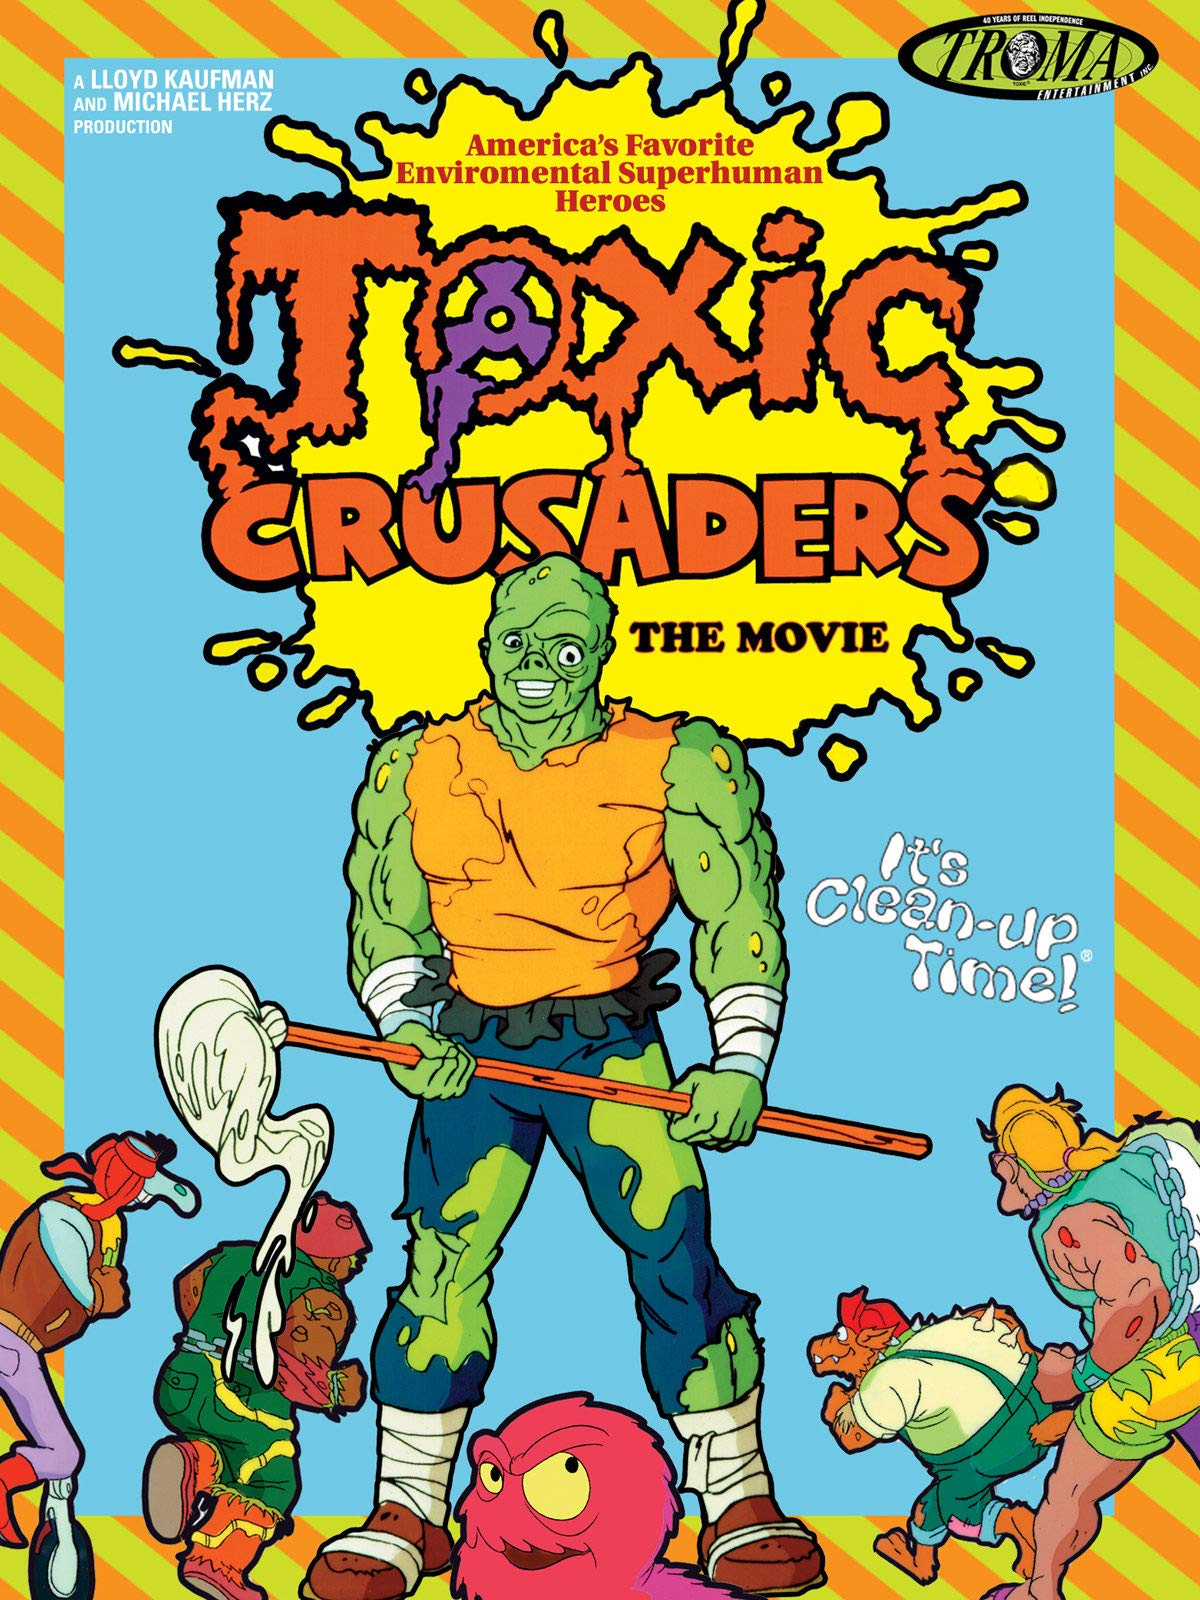 Toxic Crusaders: The Movie on Amazon Prime Video UK